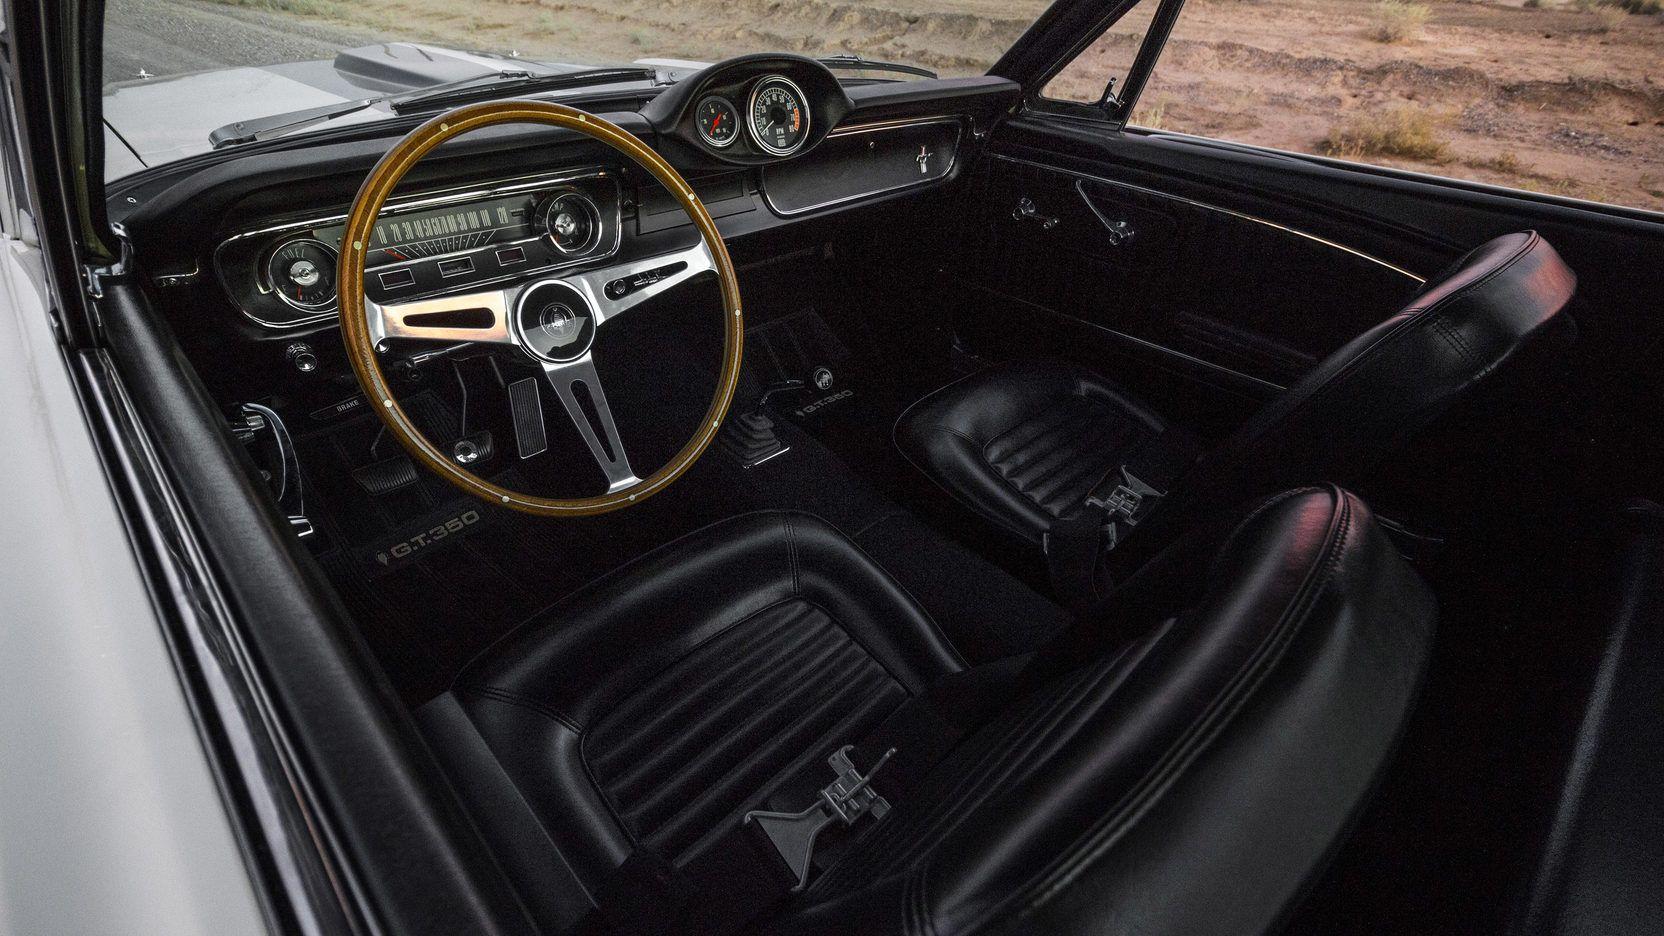 1965 Shelby Gt350 V8 289 In 4 735 Cm 306 Hp